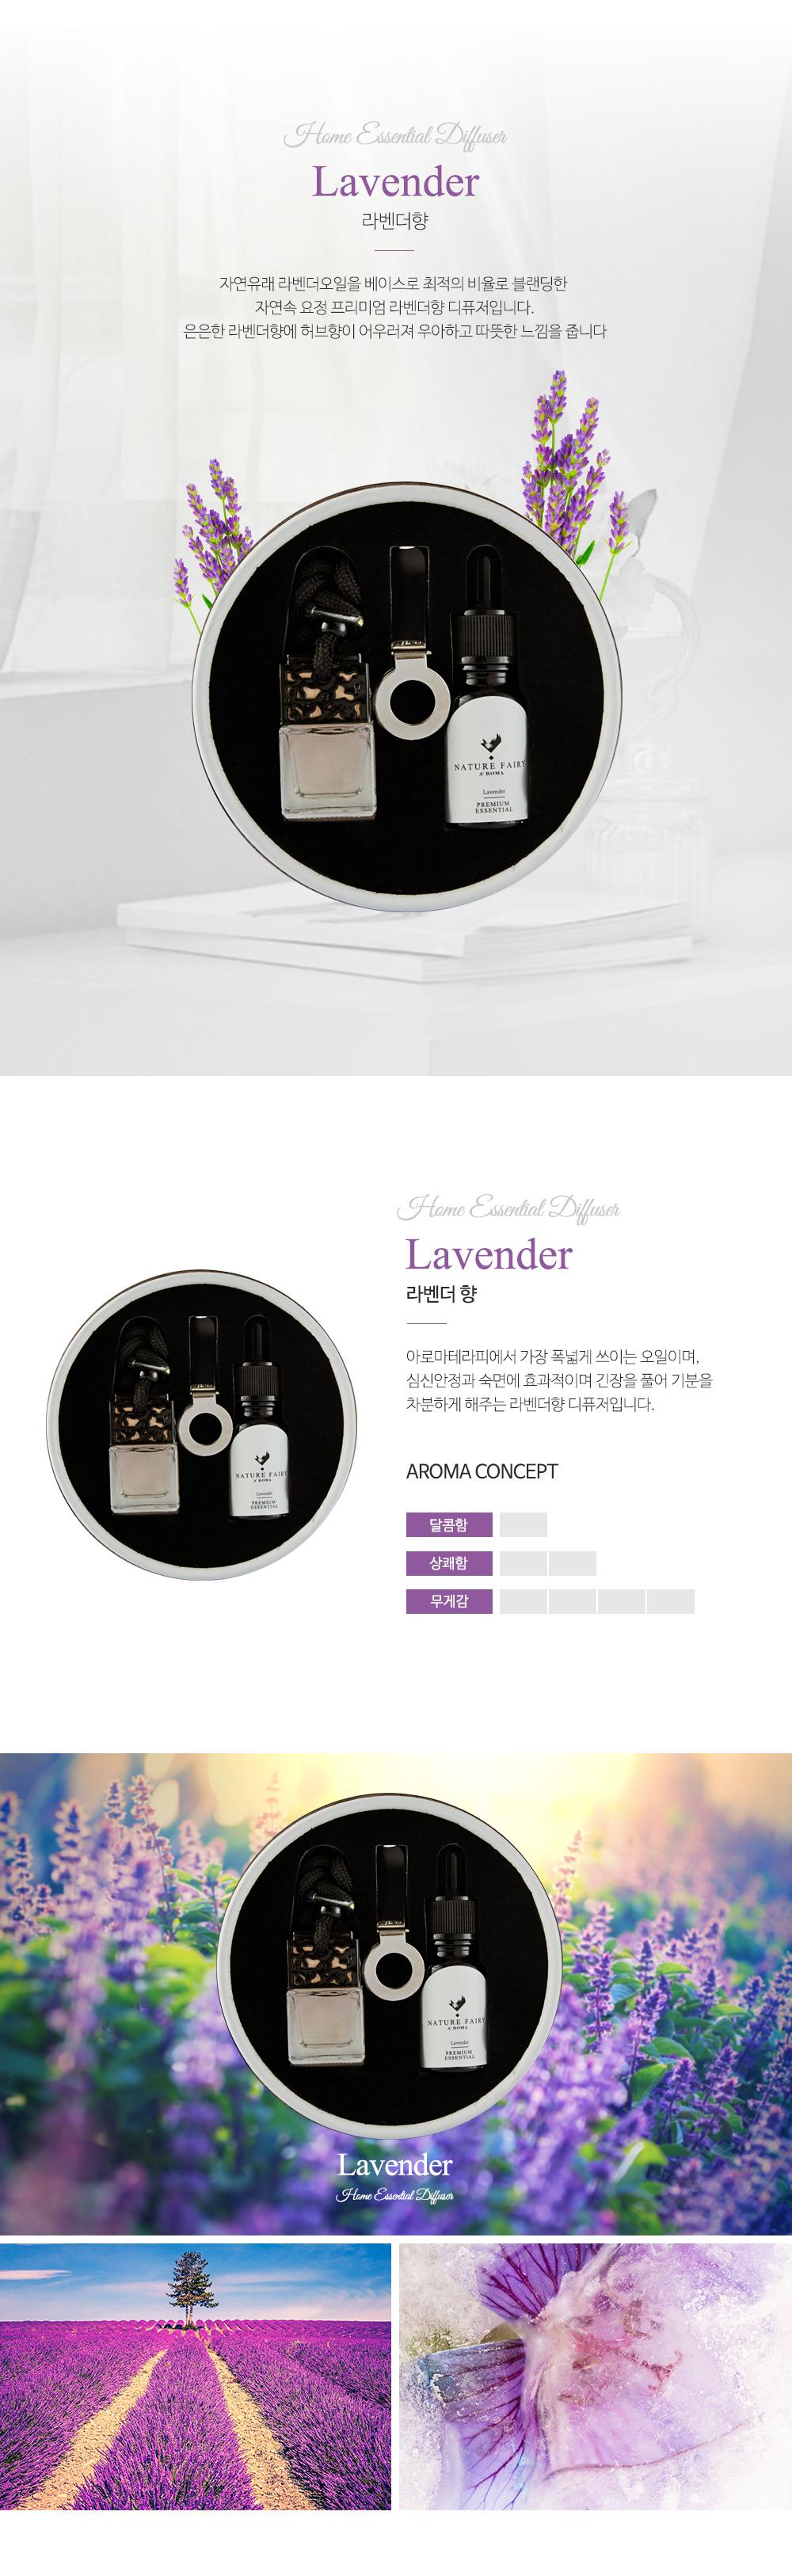 car-diffuser-lavender_02.jpg